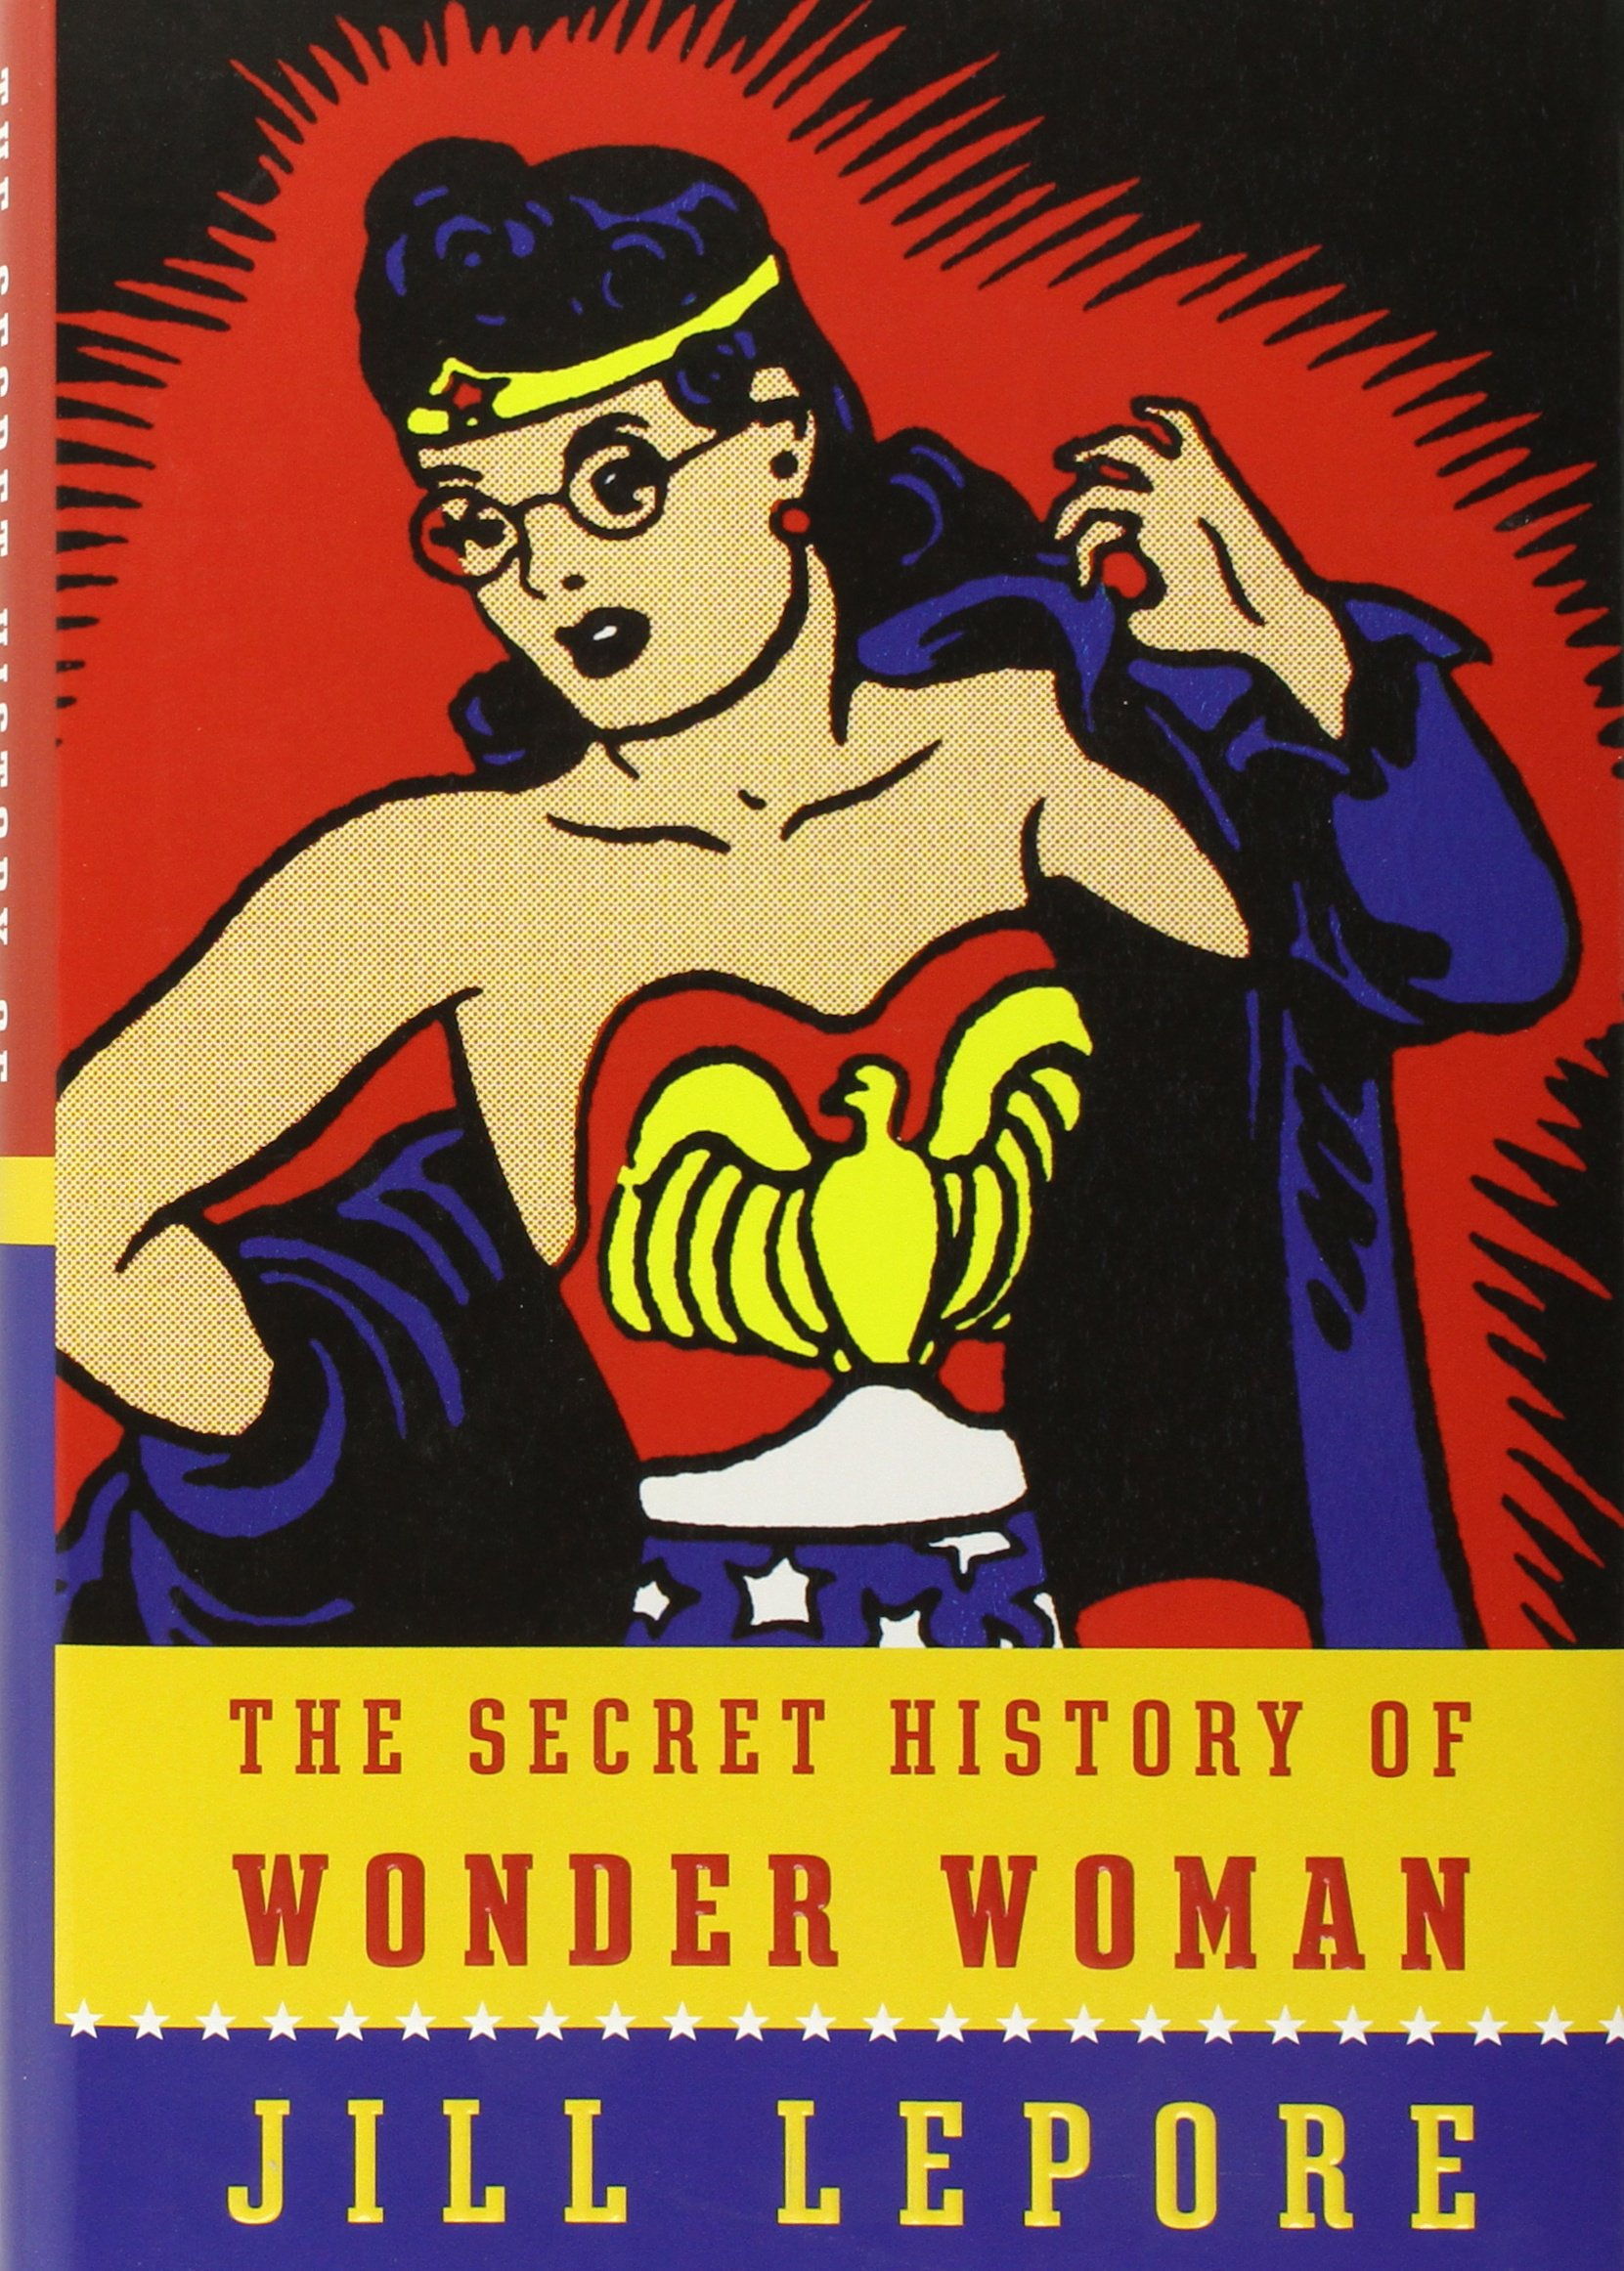 Jill Lepore - The Secret History of Wonder Woman